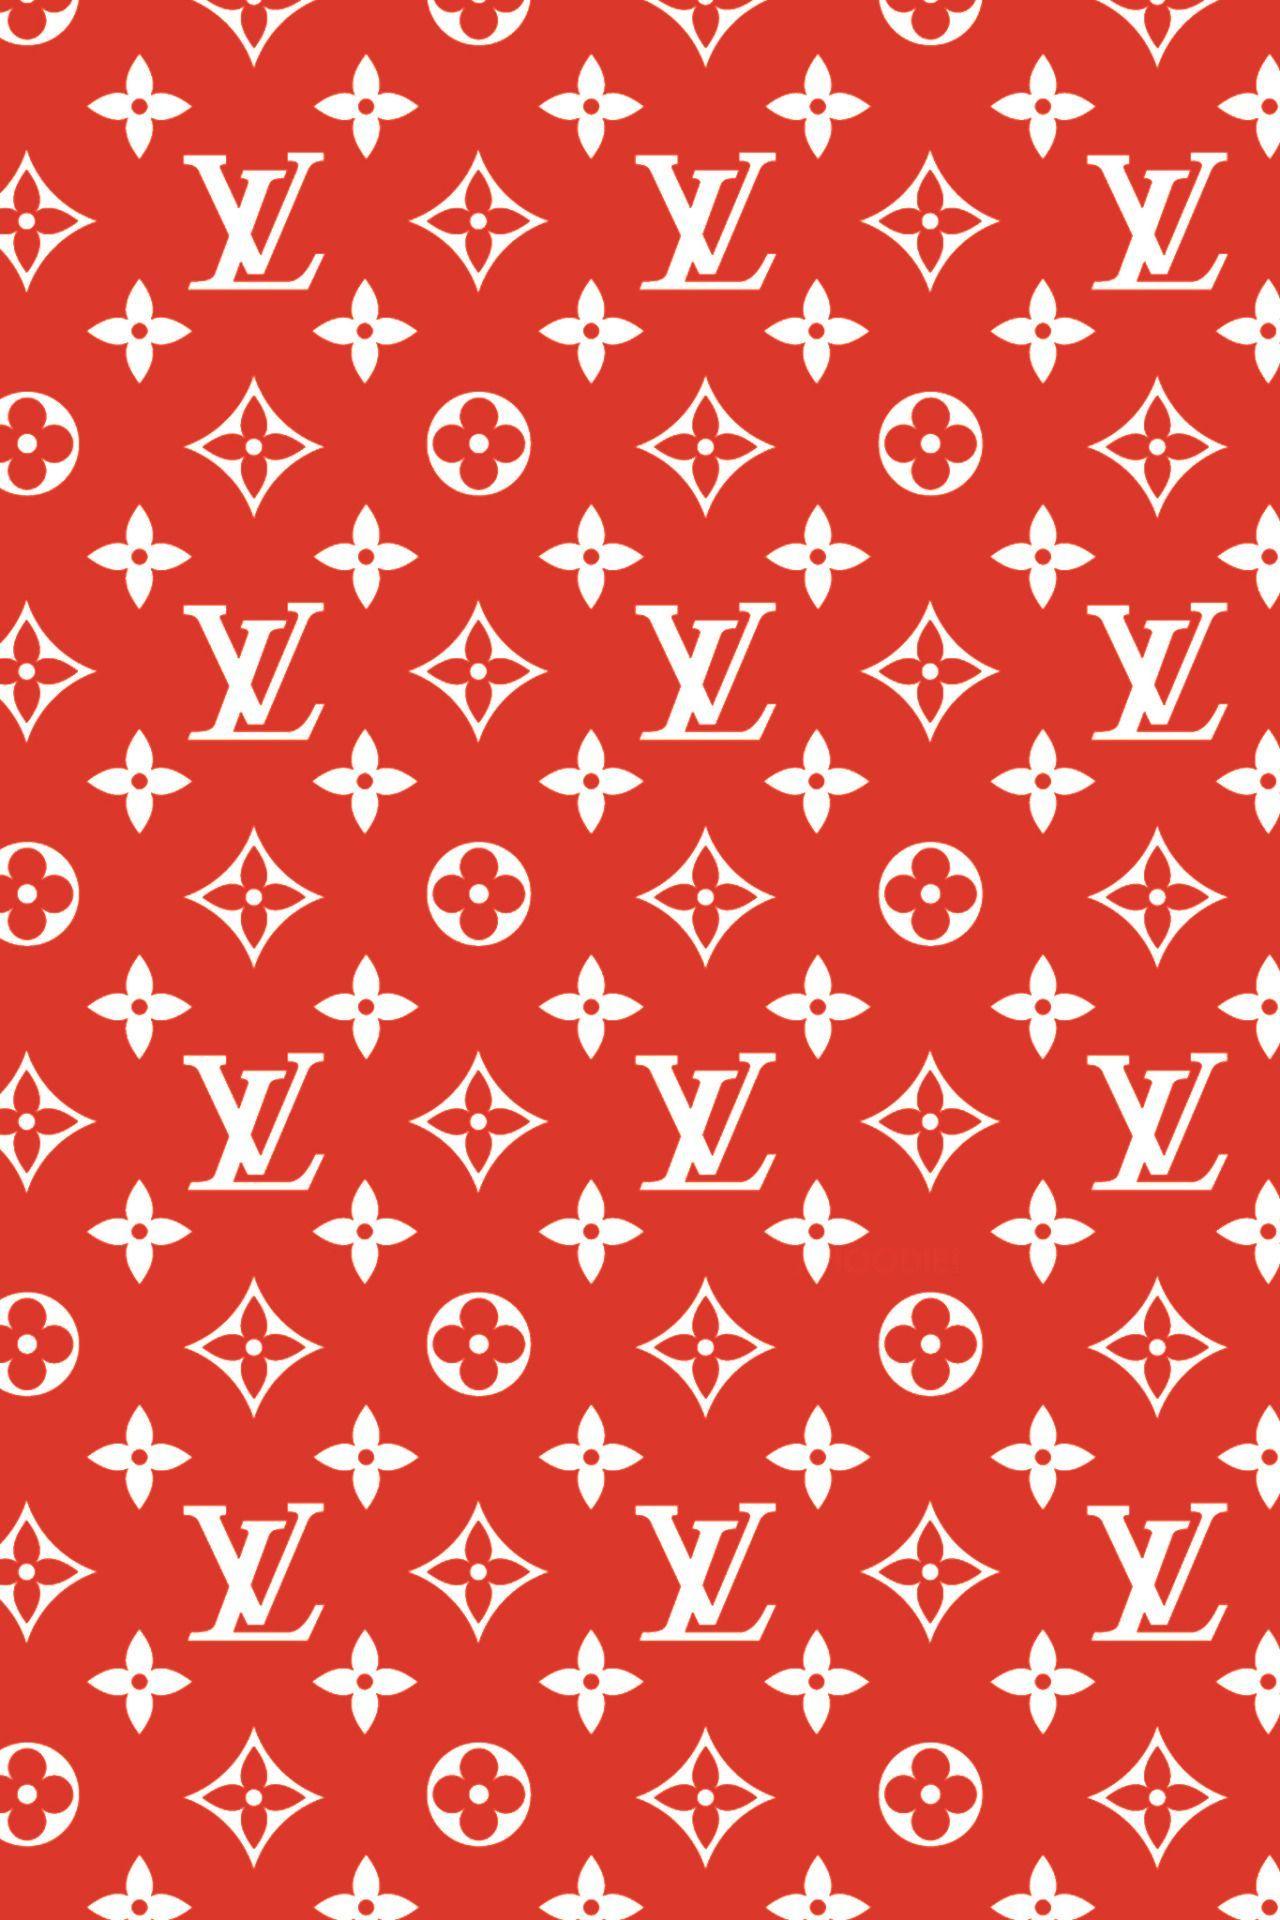 Louis Vuitton Wallpaper Red : louis, vuitton, wallpaper, Supreme, Wallpaper, Tumblr#supreme, #tumblr, #wallpaper, Monogram, Wallpaper,, Louis, Vuitton, Iphone